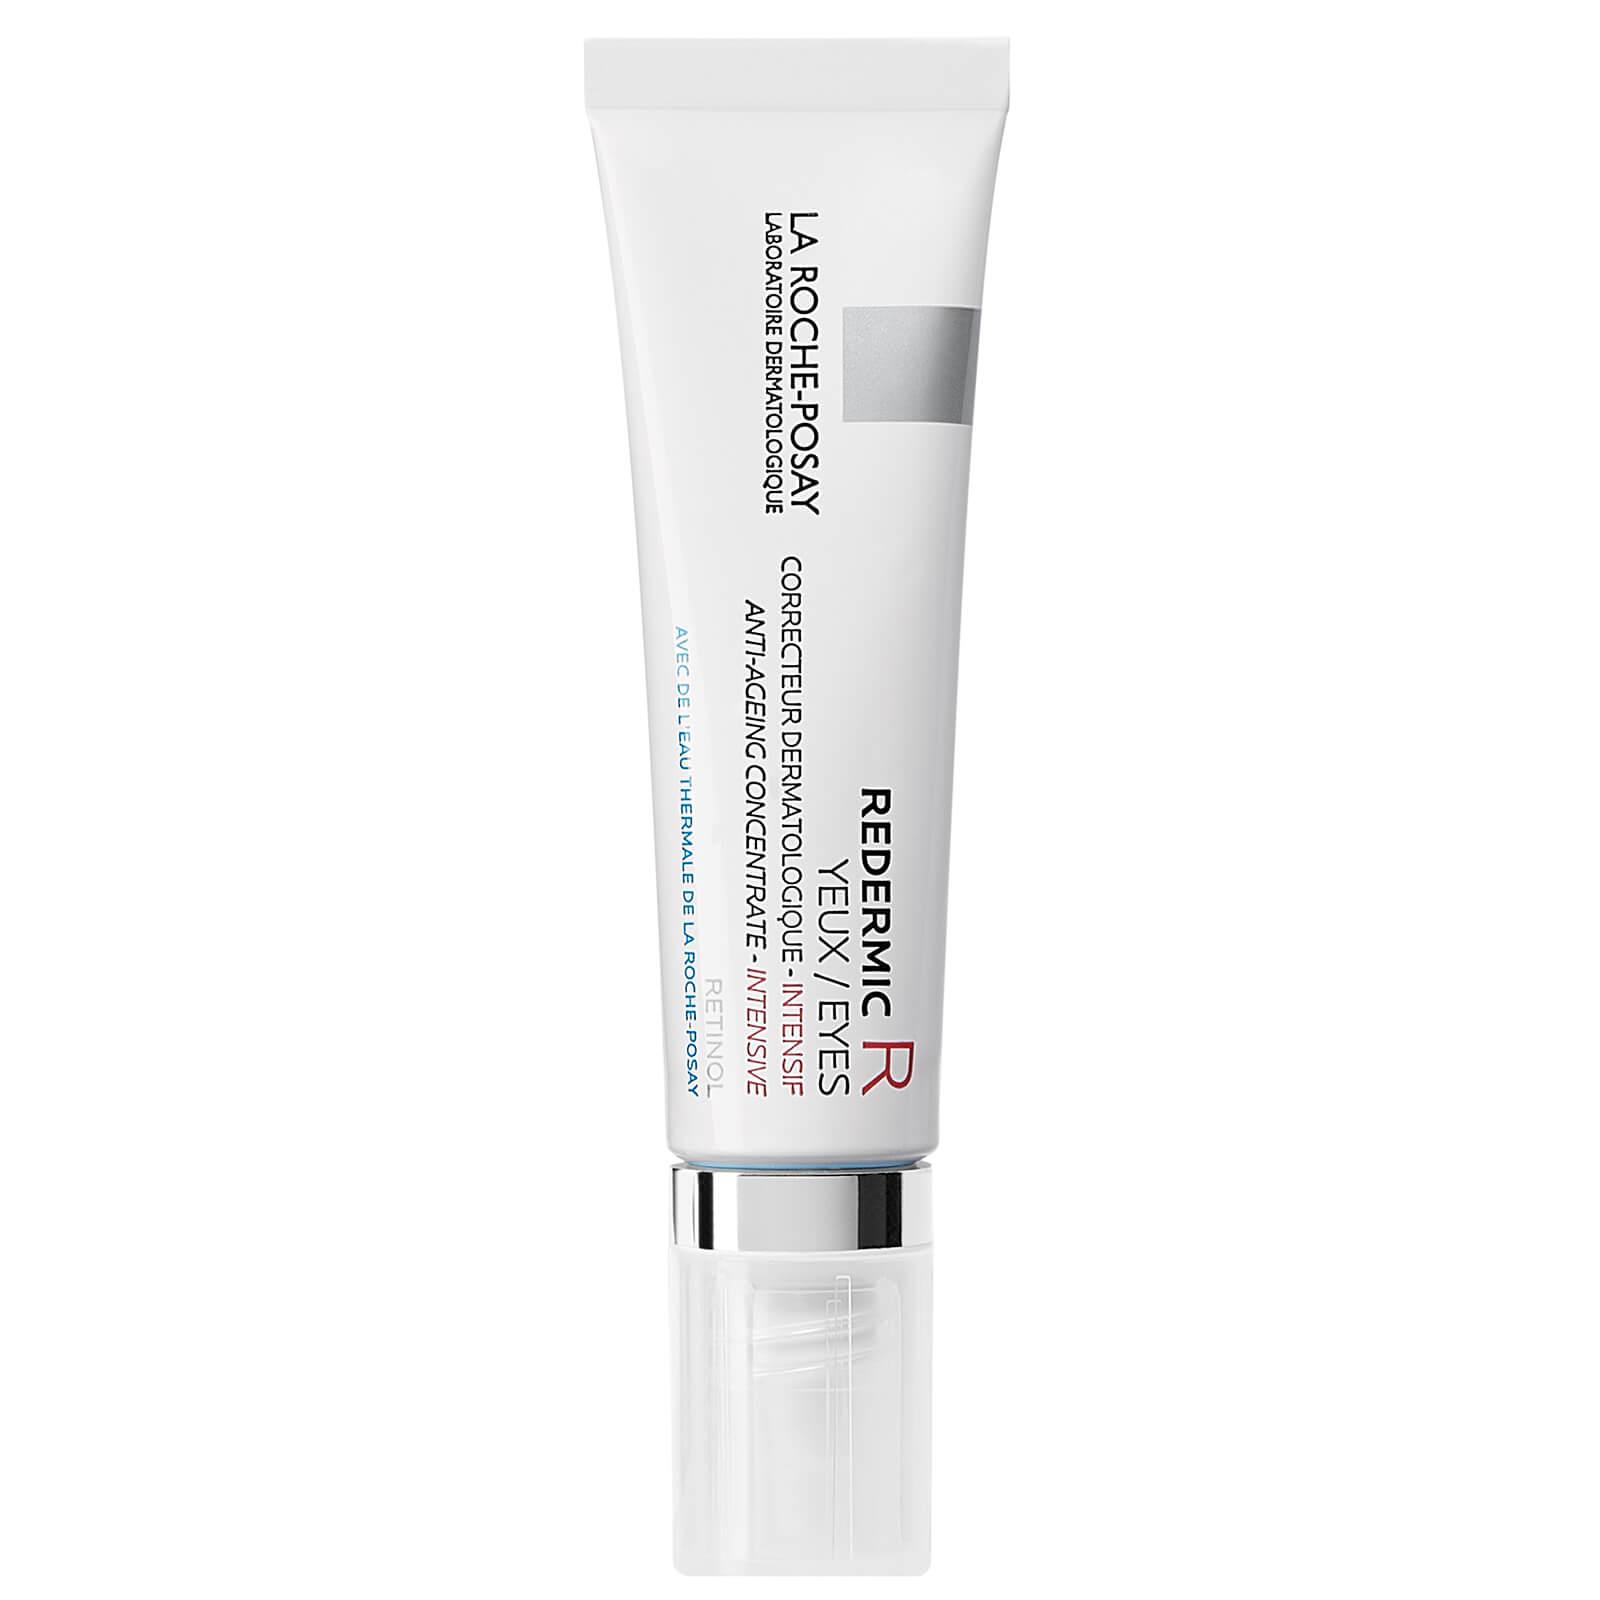 La Roche-Posay Redermic [R] Retinol Eye Cream 15ml